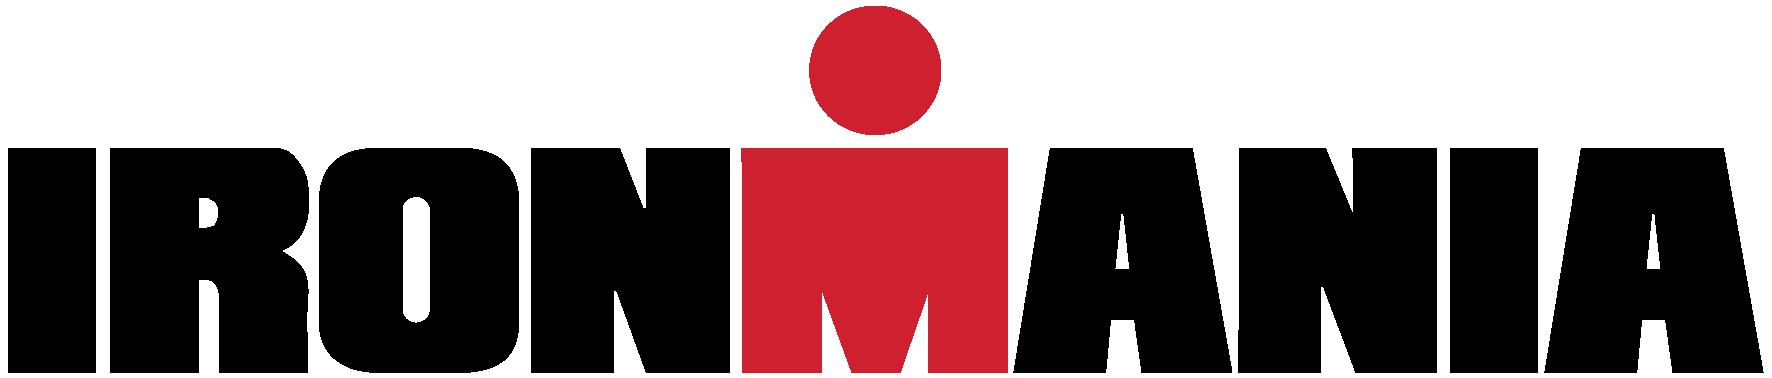 Ironmania - Start 174 kg, Cél: Ironman - Ketogén étrenddel